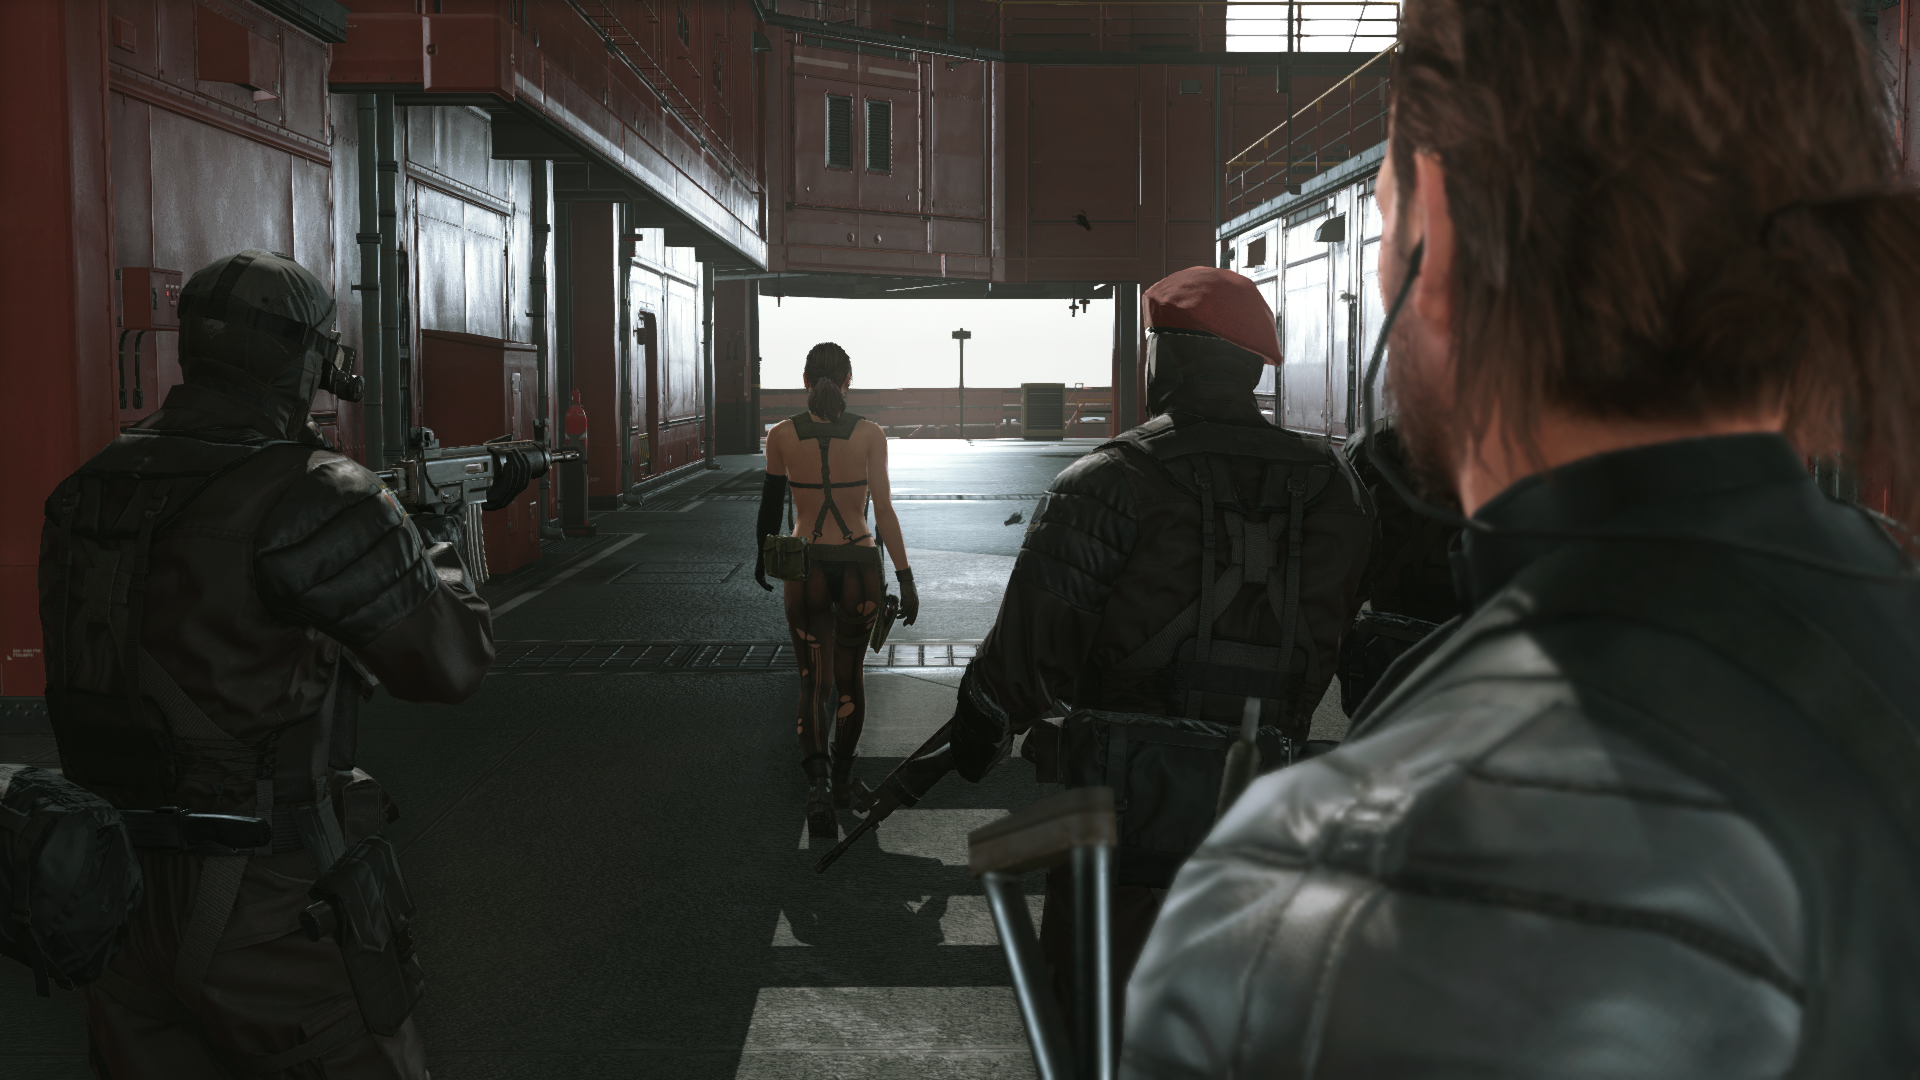 mgsvtpp_2017_07_23_01_08_23_486.png - Metal Gear Solid 5: The Phantom Pain